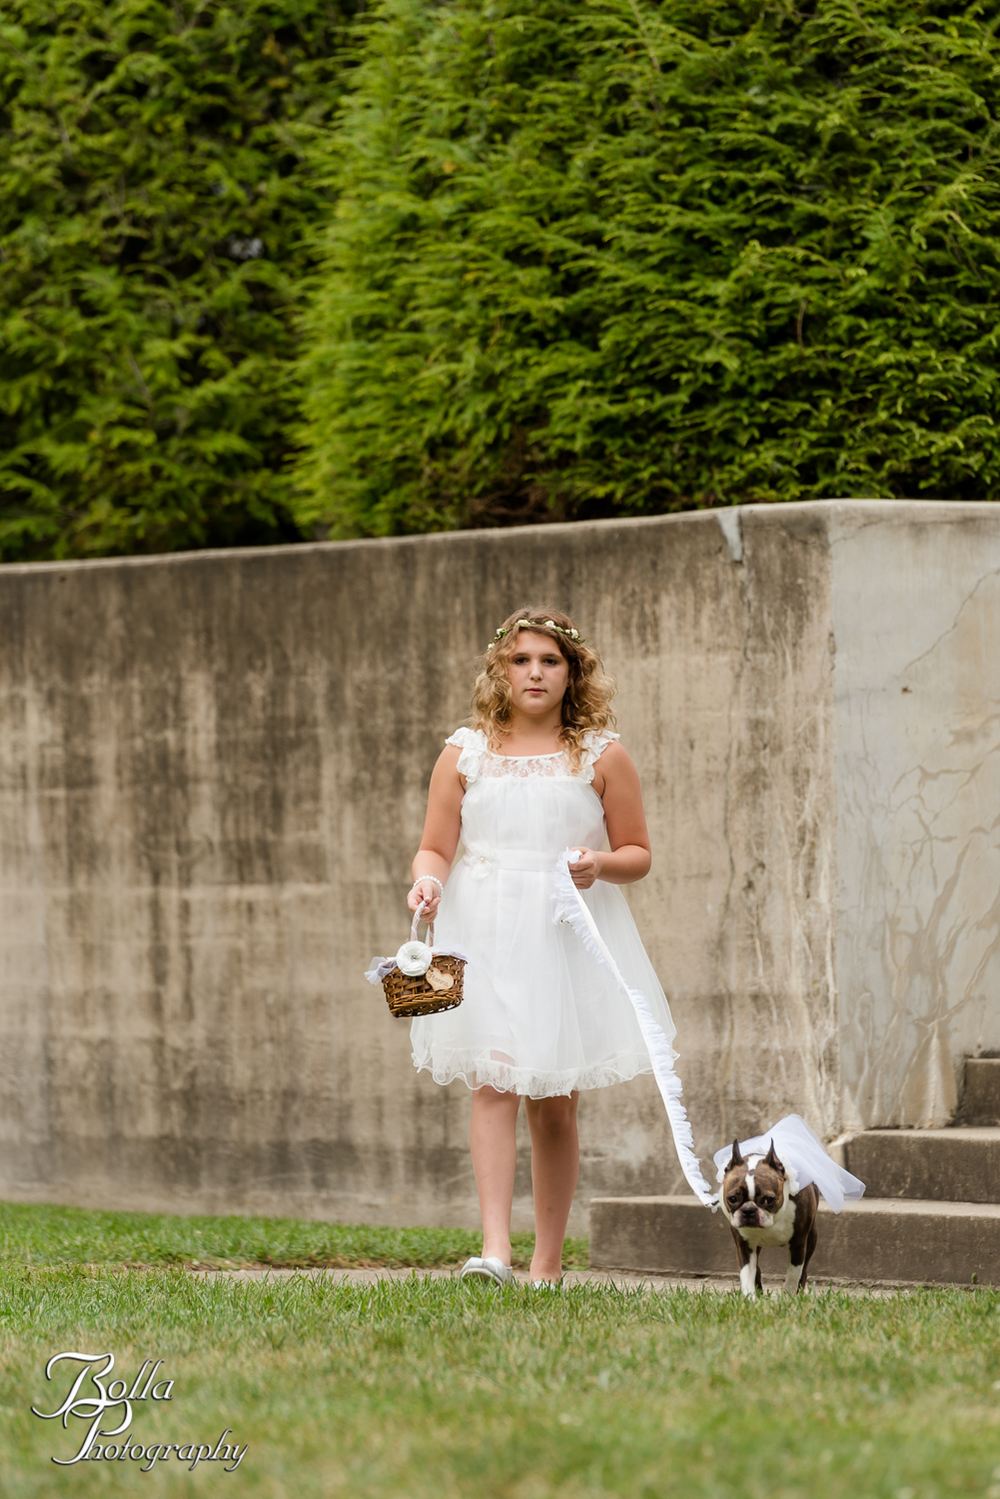 Bolla_Photography_St_Louis_wedding_photographer-0211.jpg